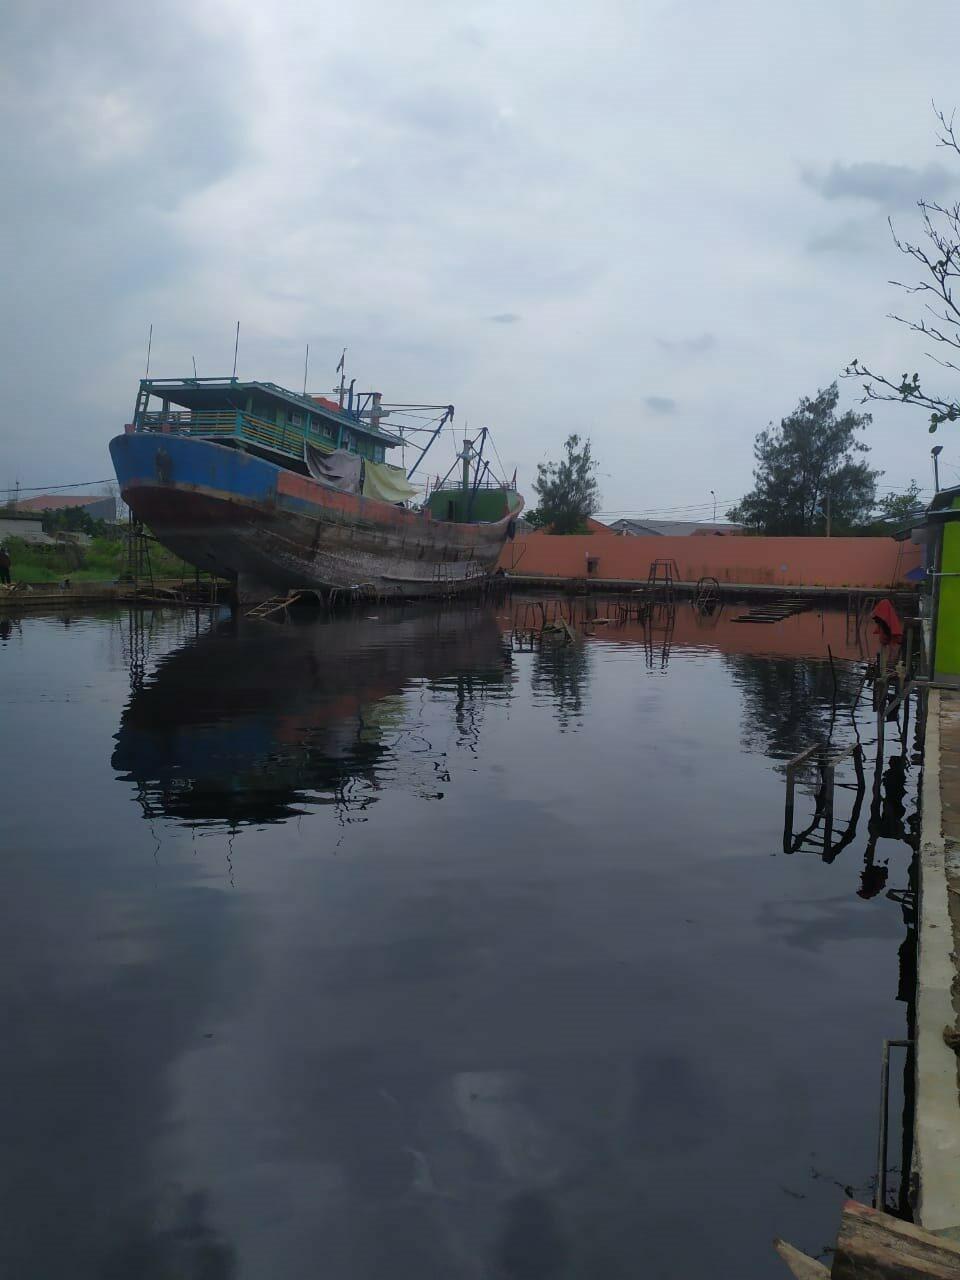 Pecahkan Kendala Penanganan Rob, Kemenko Marves Kunjungi Bantaran Sungai Loji Pekalongan